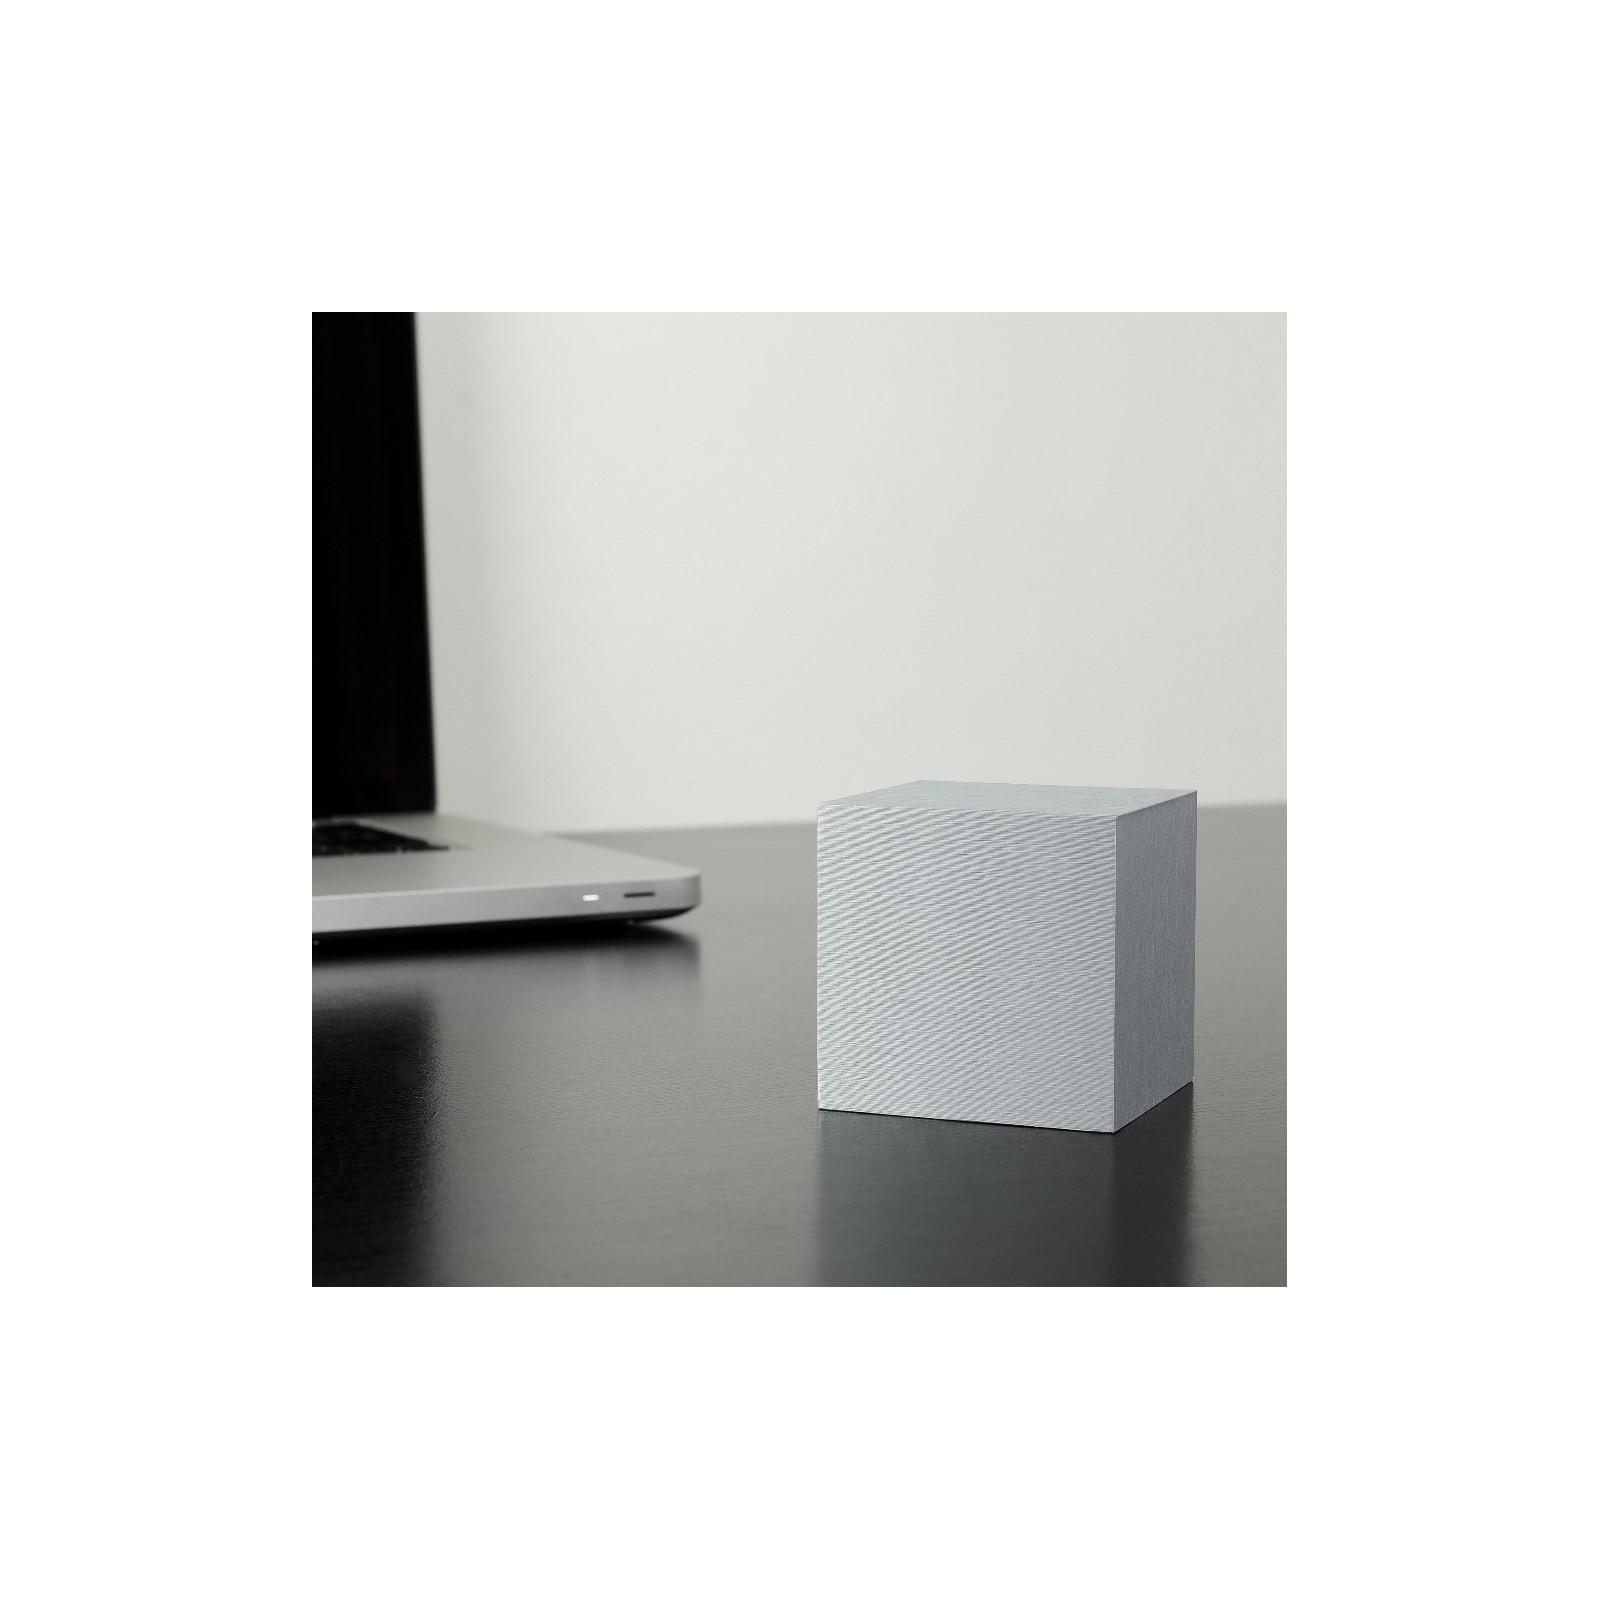 reveil au carr aluminium arne concept. Black Bedroom Furniture Sets. Home Design Ideas